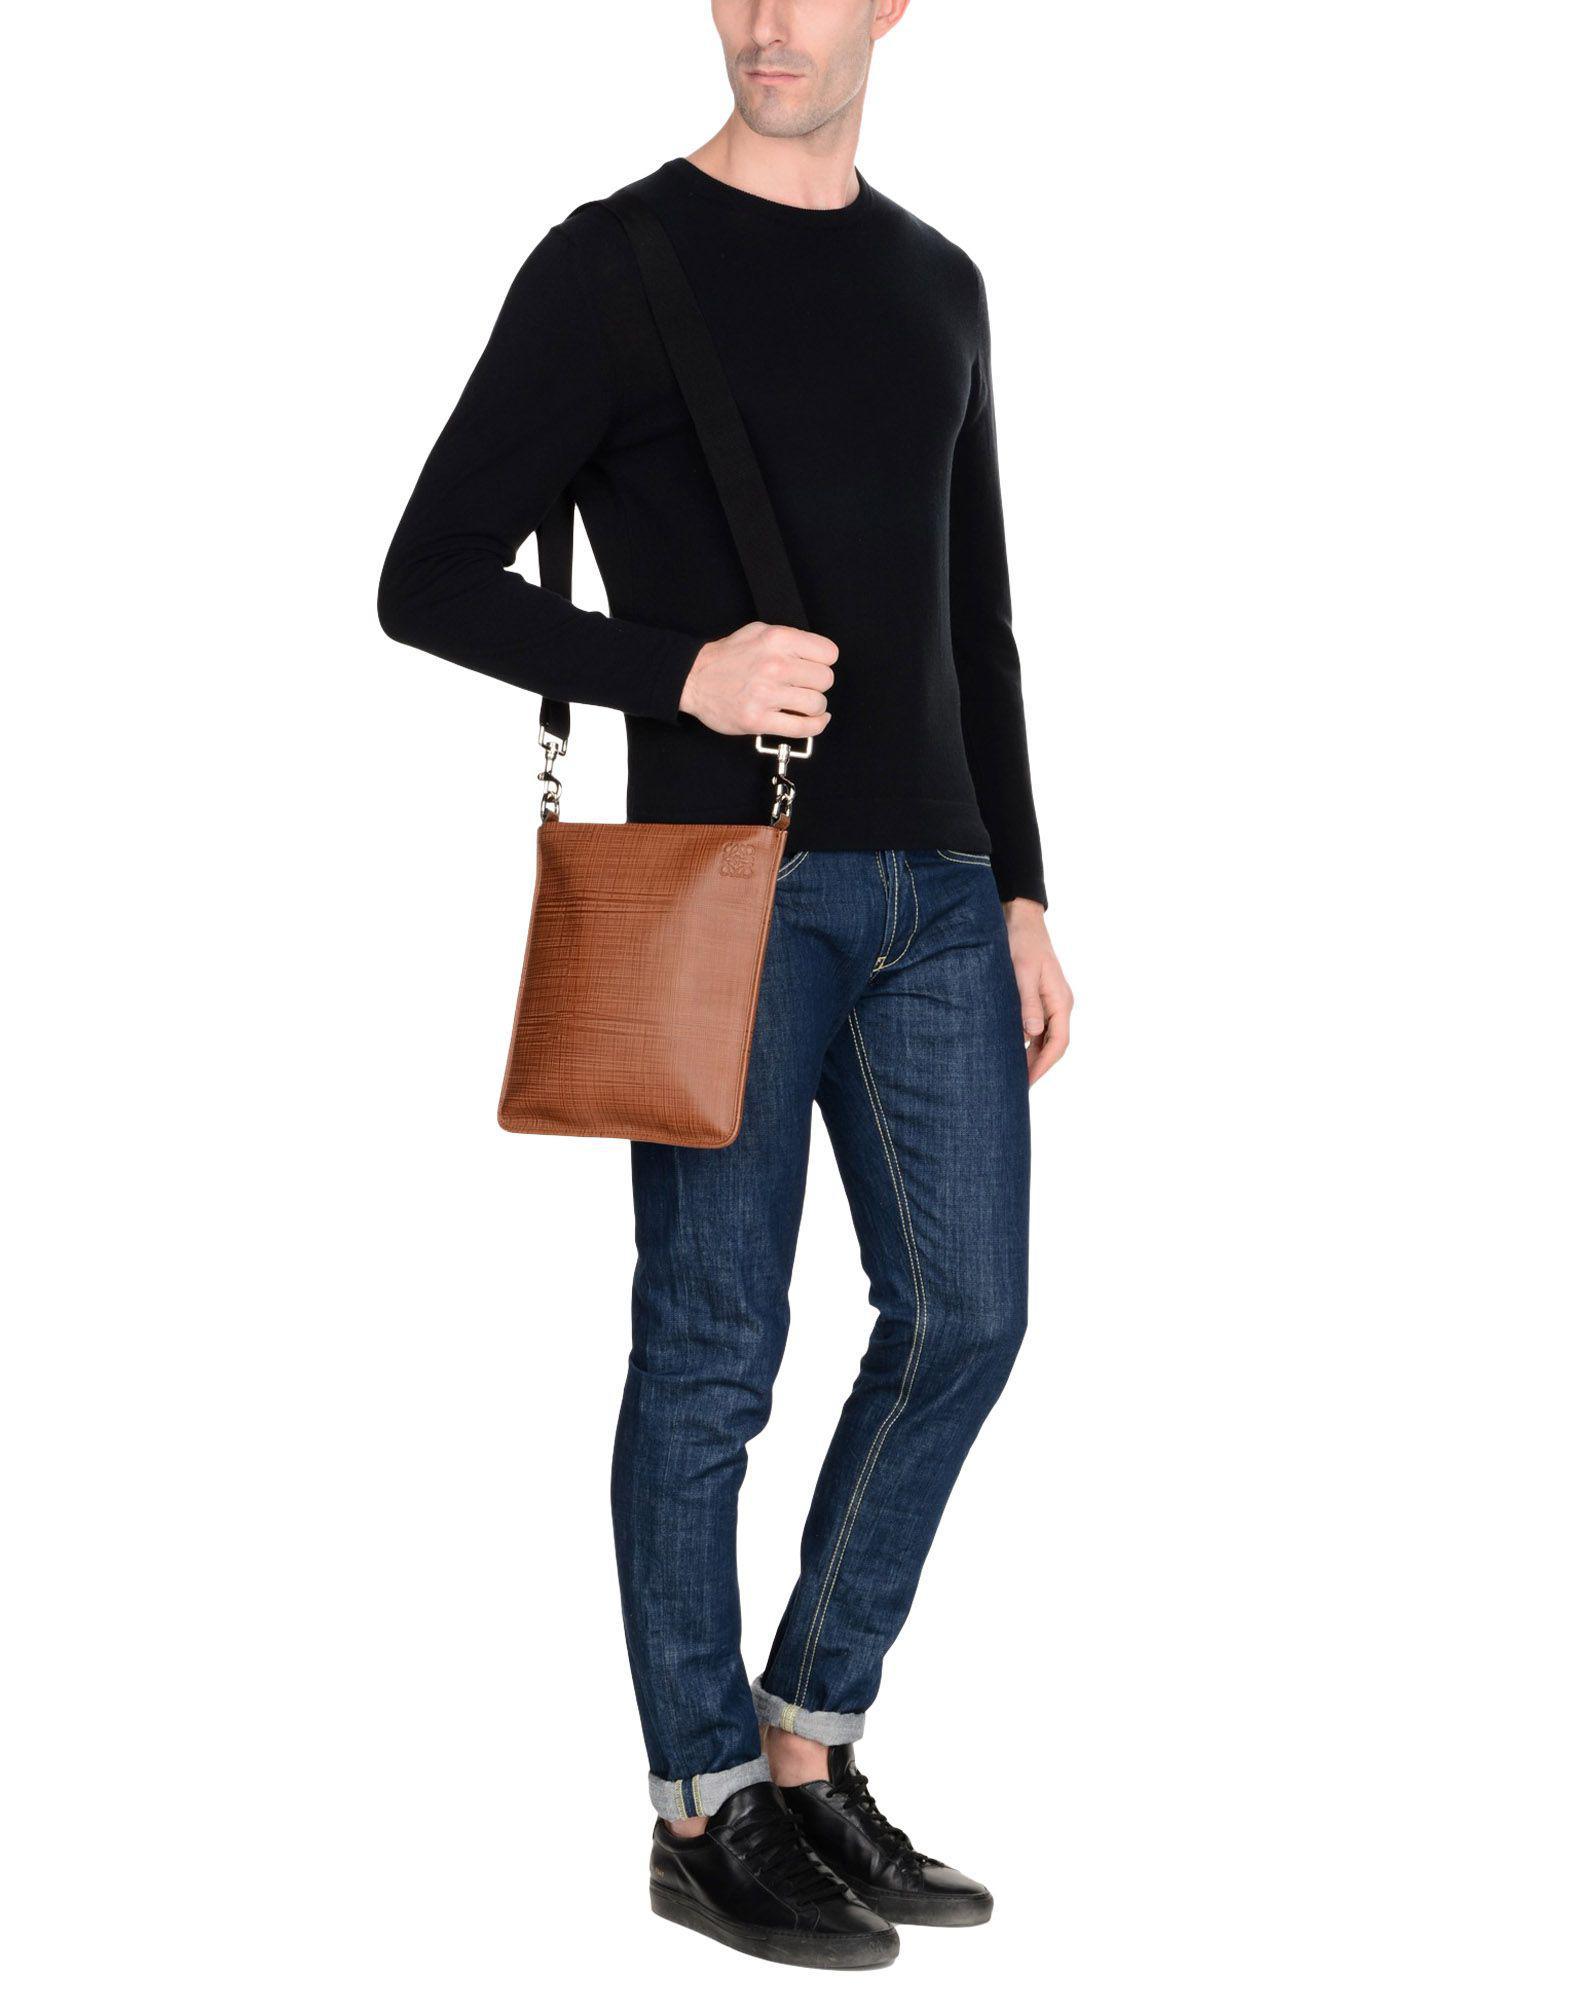 Loewe Leather Cross-body Bag in Brown for Men